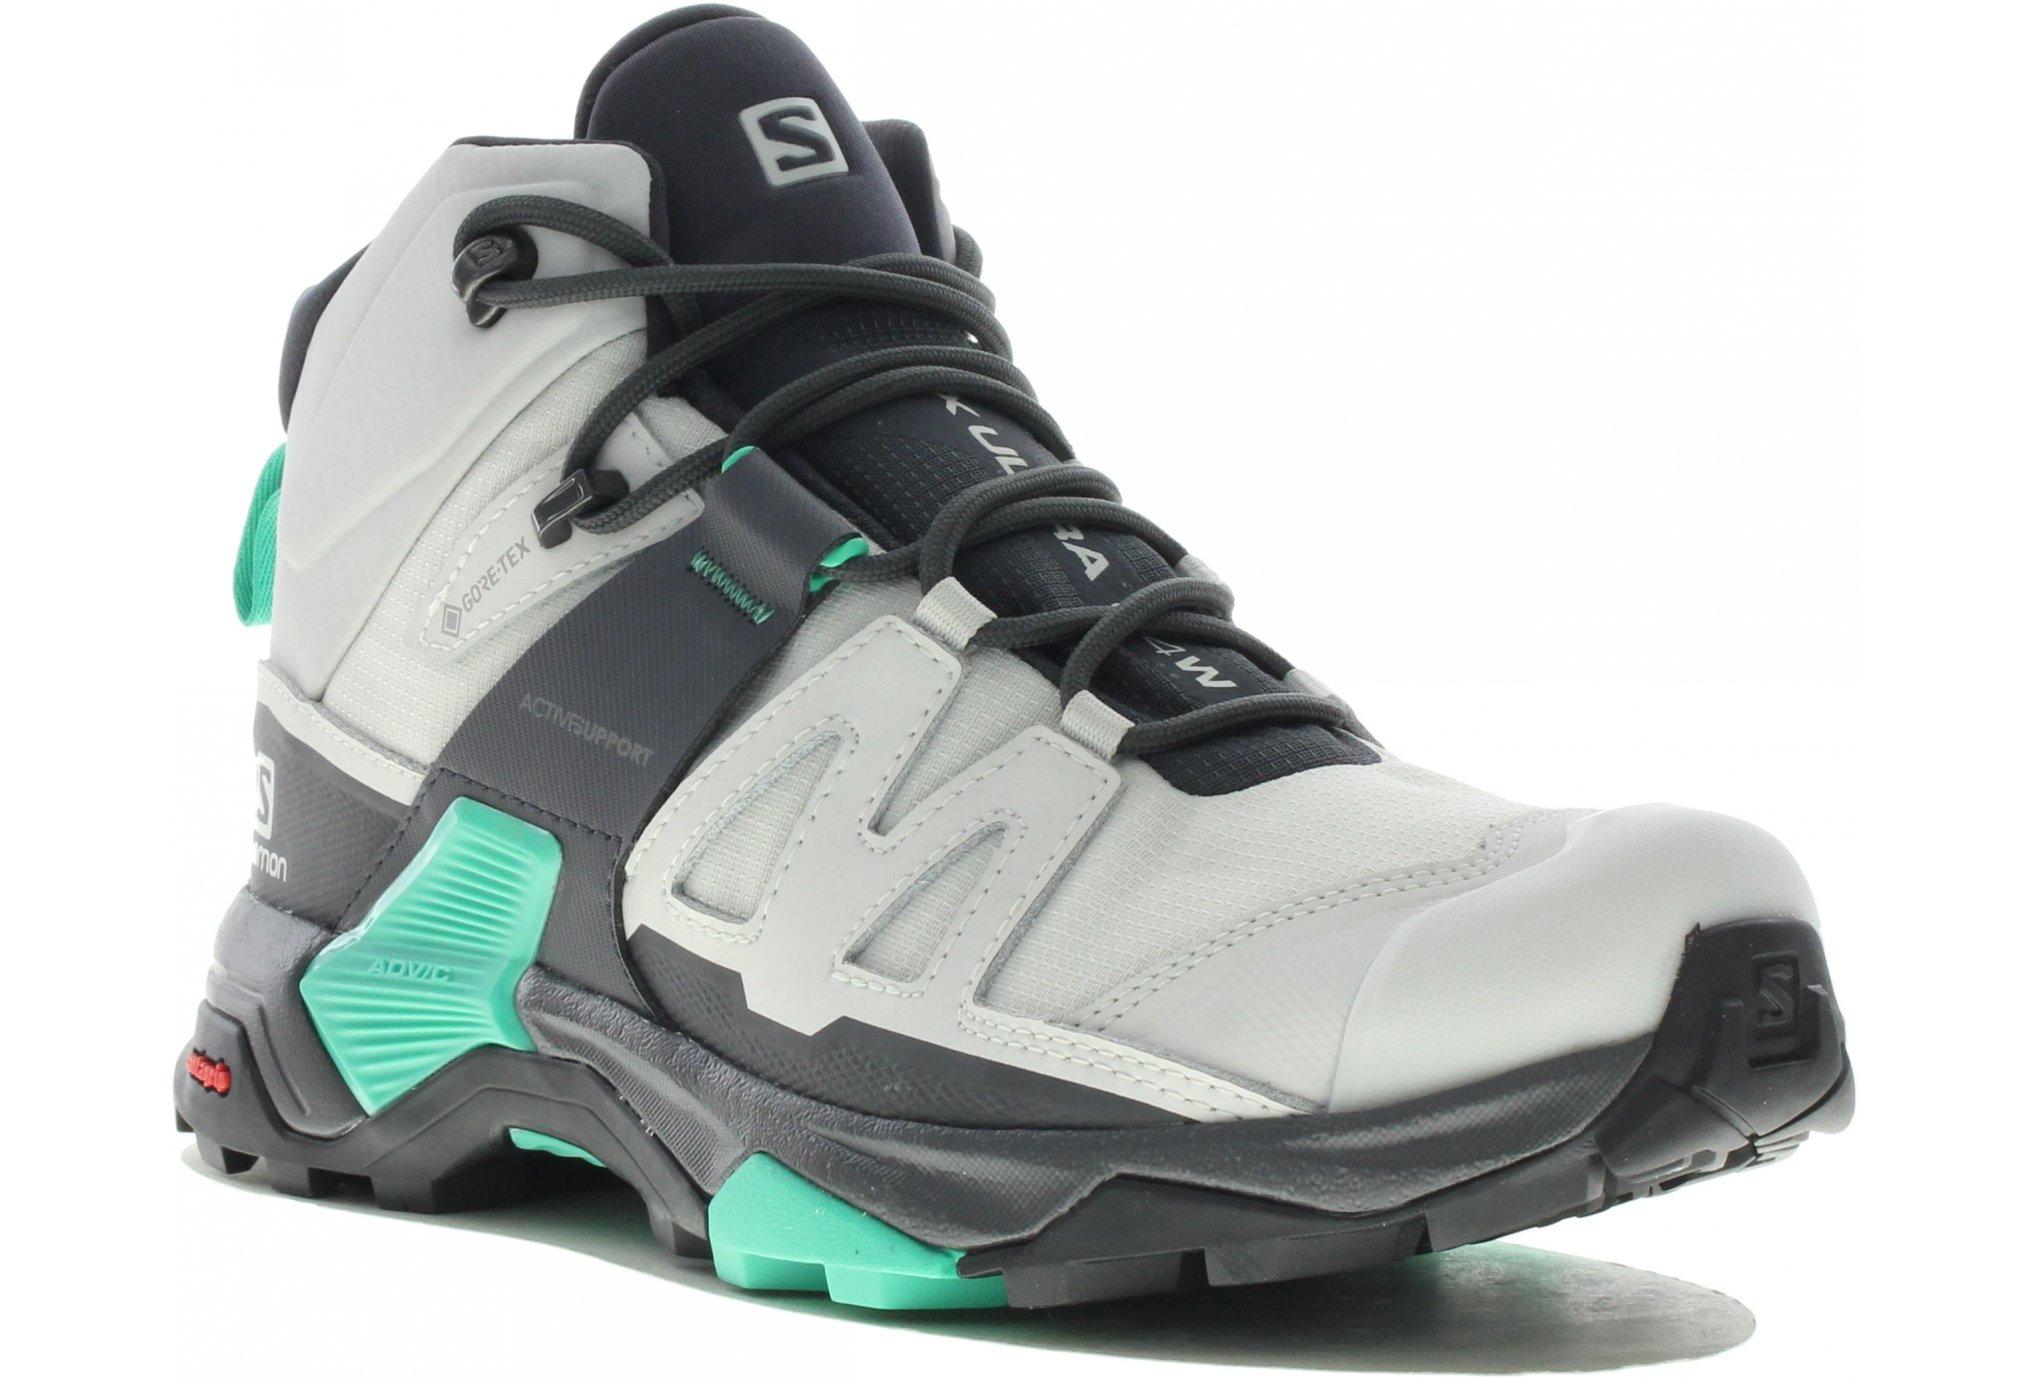 Salomon X Ultra 4 Mid Gore-Tex W Chaussures running femme